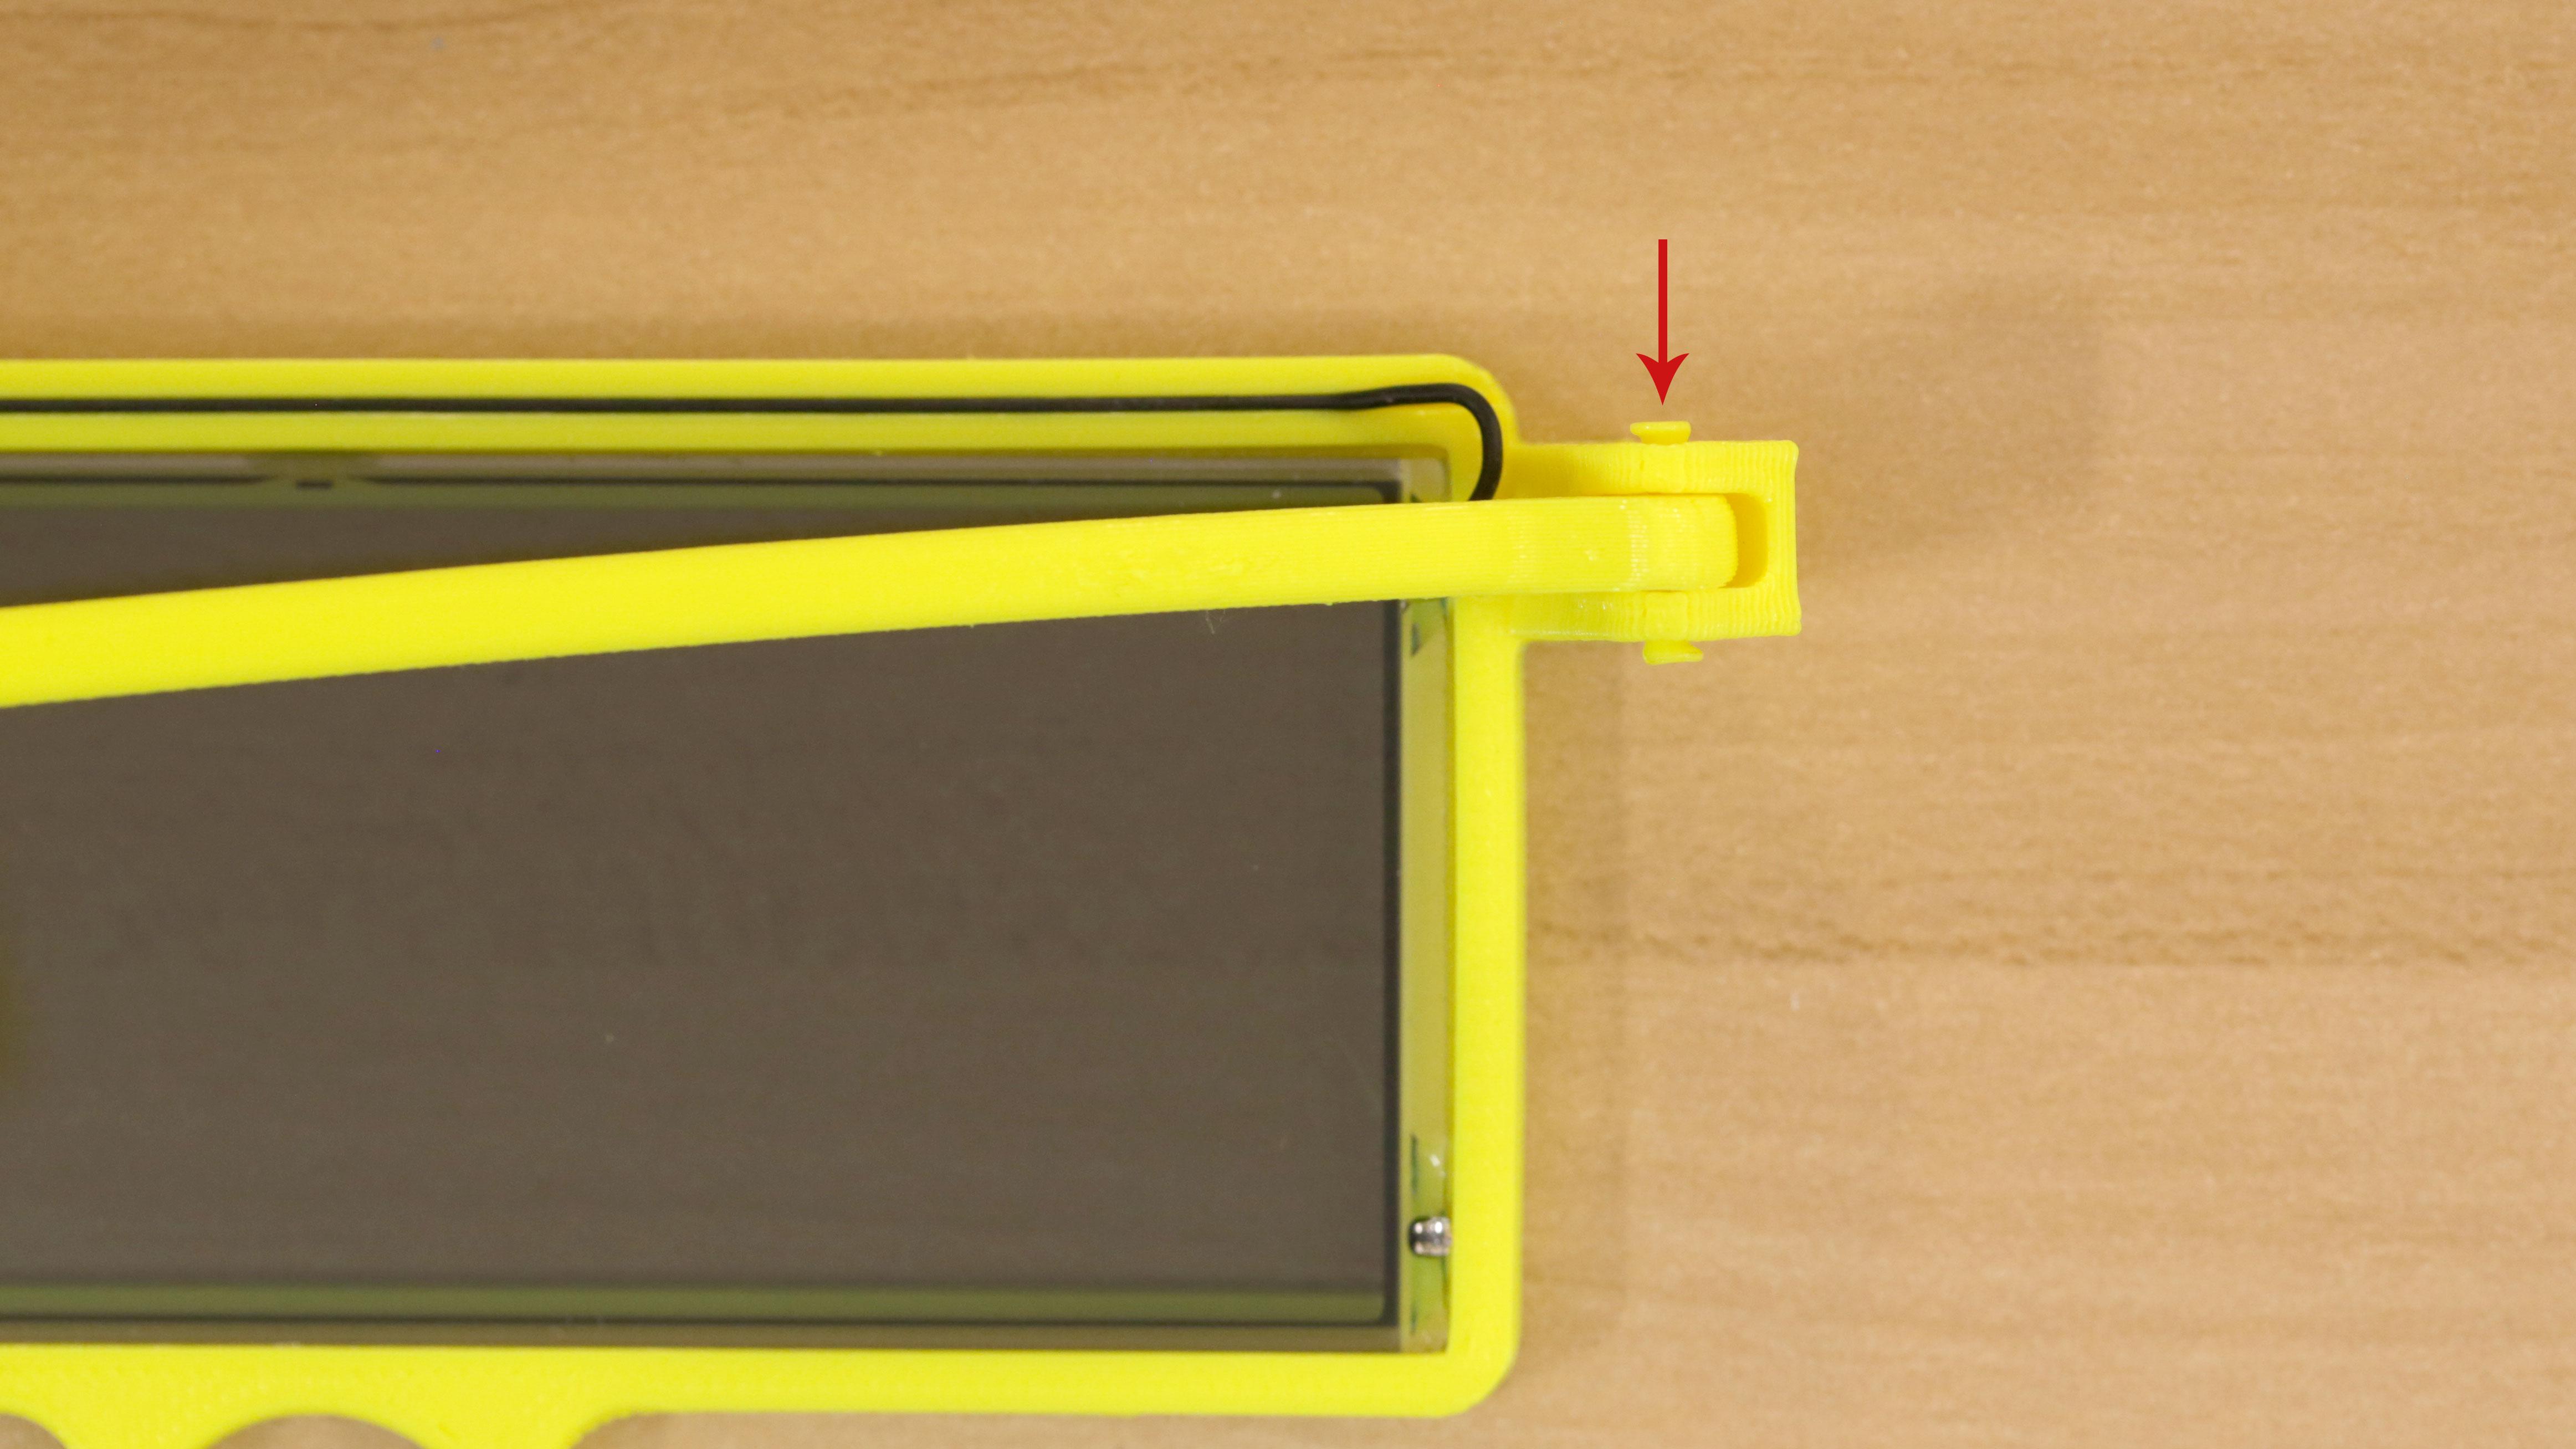 lcds___displays_filament-hinge.jpg